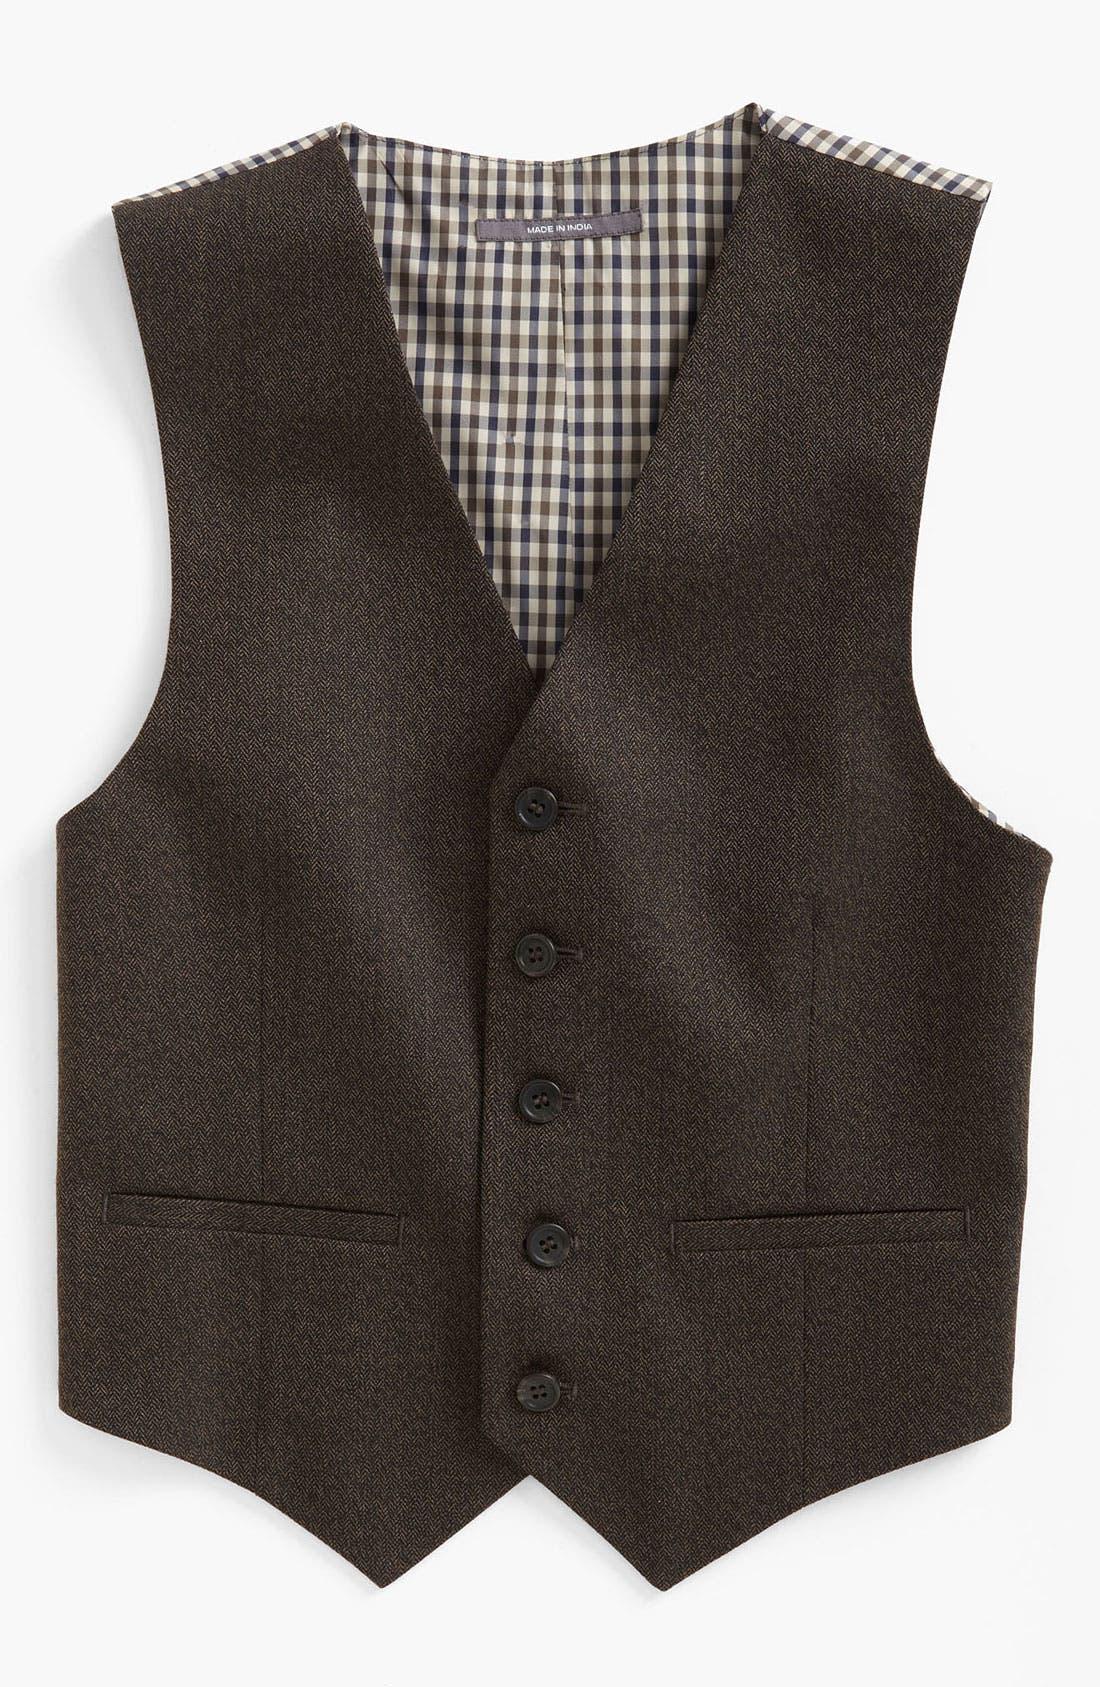 Main Image - Nordstrom 'Andrew' Herringbone Vest (Big Boys)